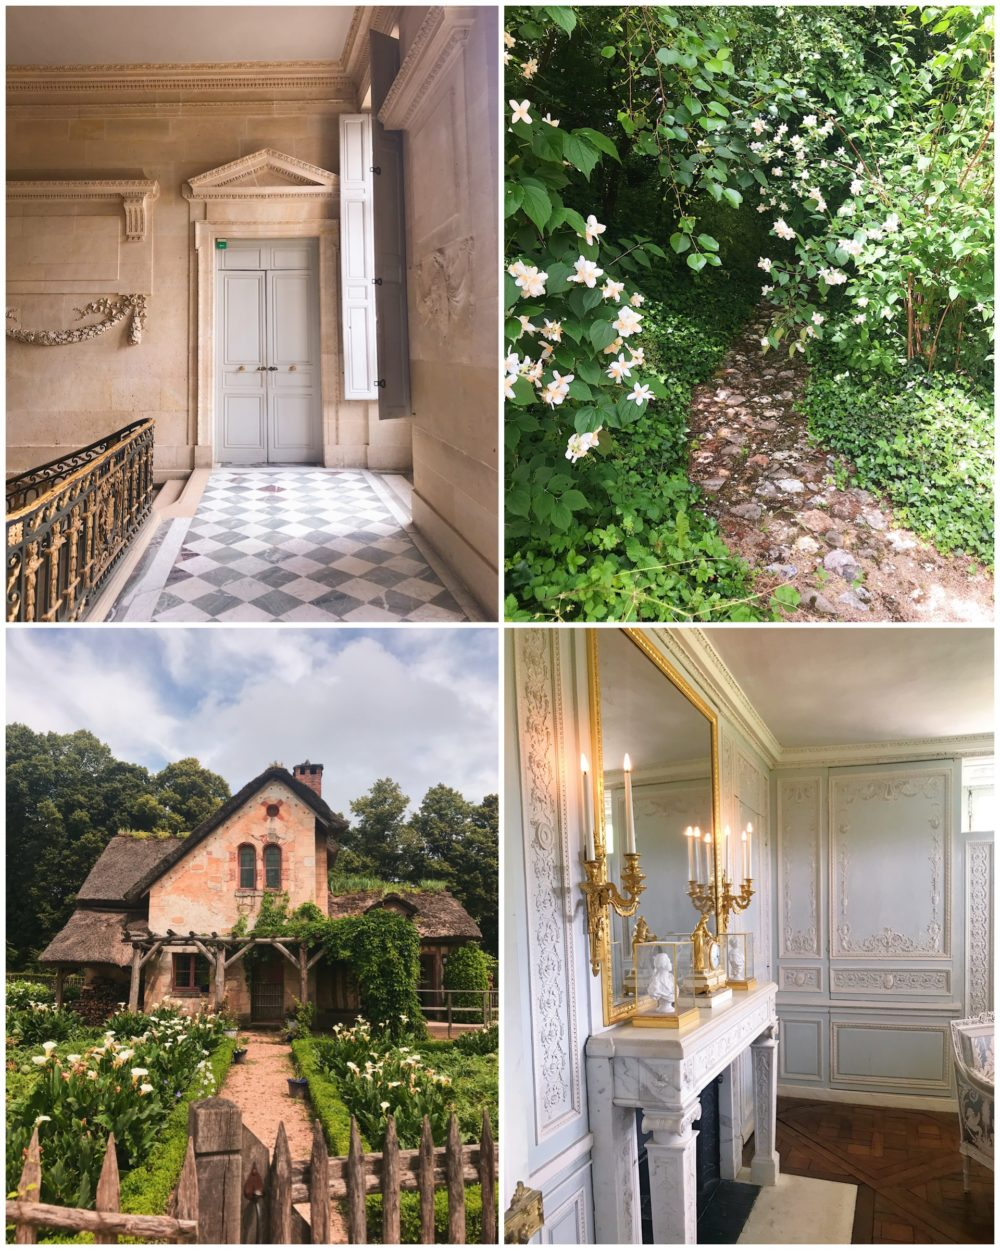 Versailles-France-tour-of-Queens-Quarters-e1530910288604.jpg